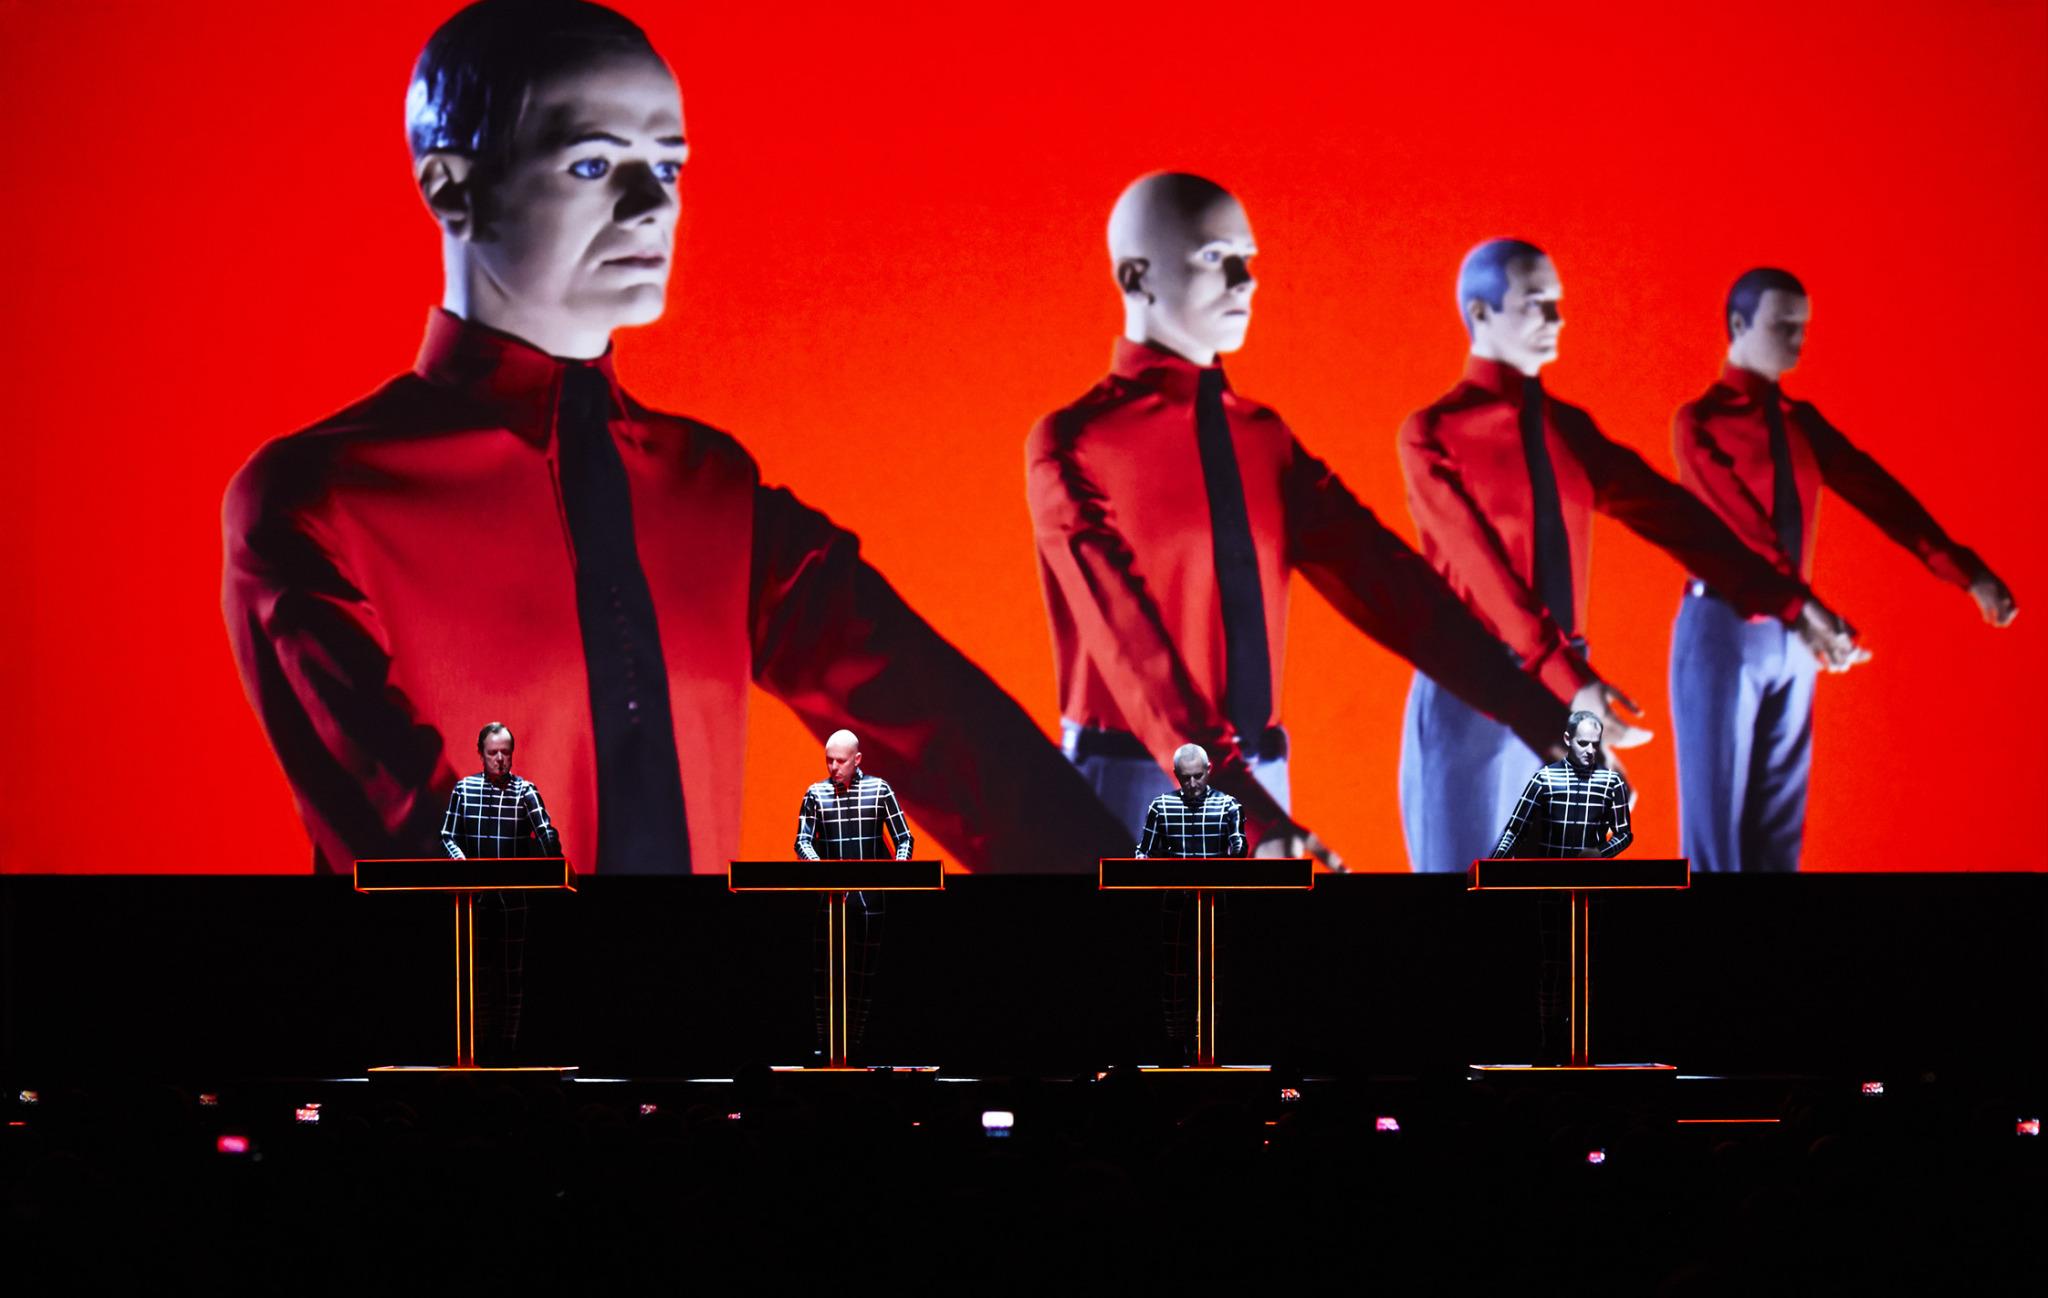 Kraftwerk on Cycling, 3D, 'Spiritual Connection' to ...Kraftwerk